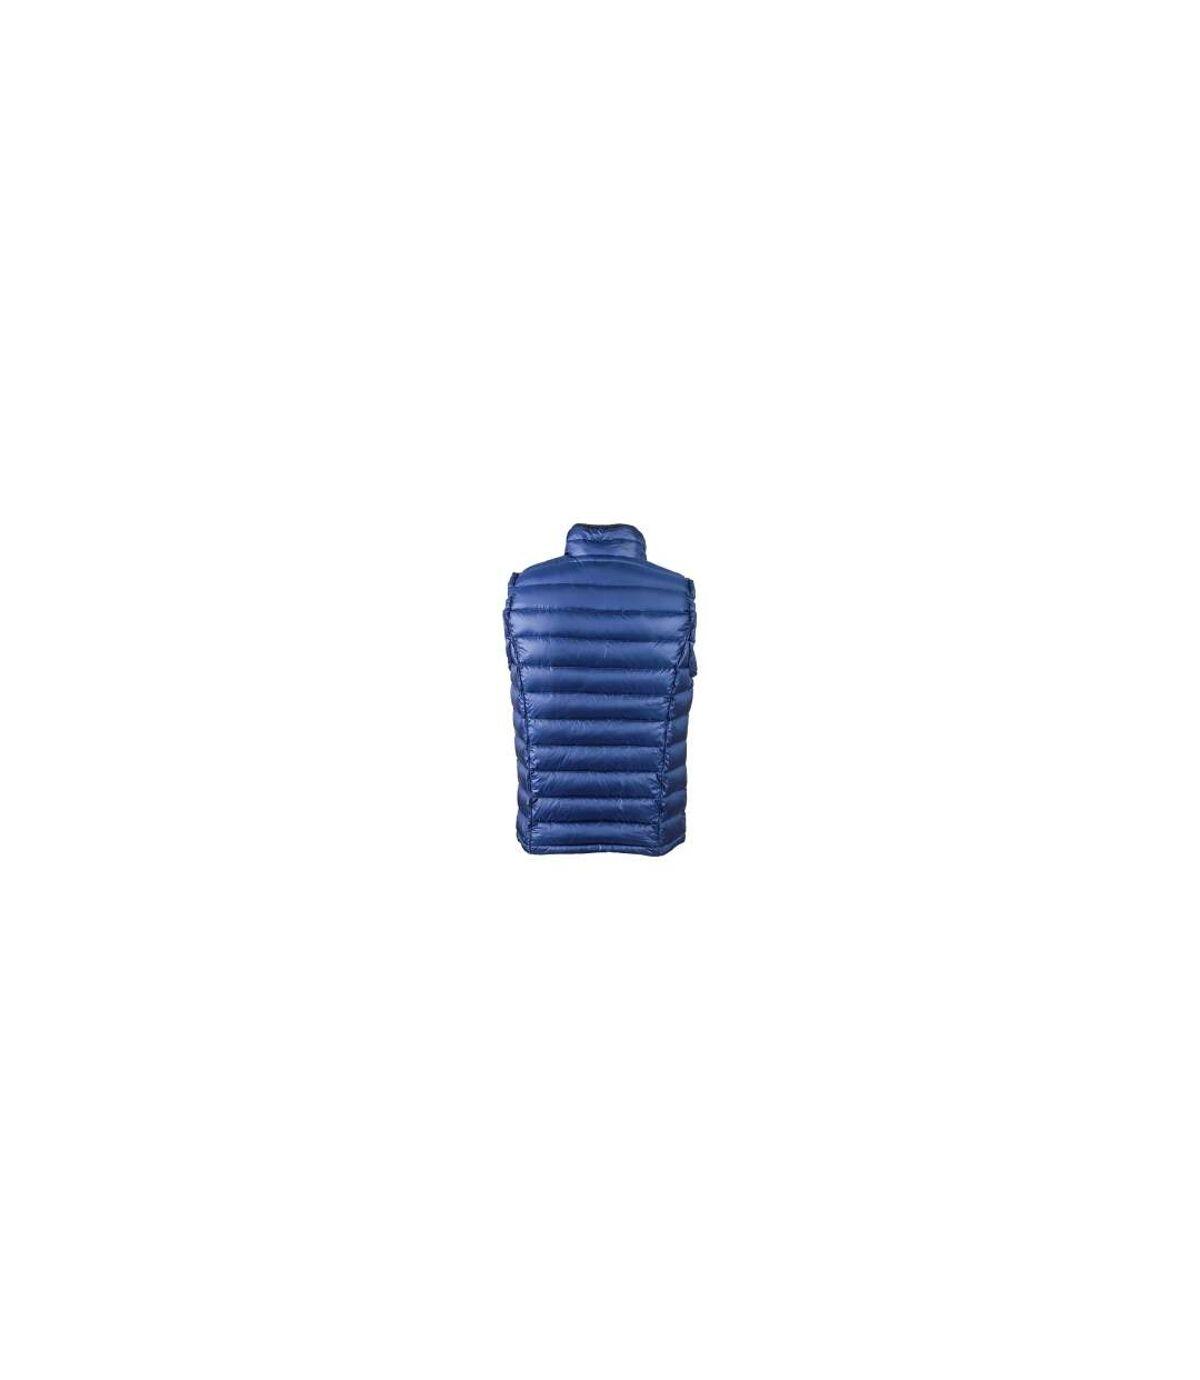 Gilet sans manche matelassé duvet HOMME - JN1080 bleu - doudoune anorak